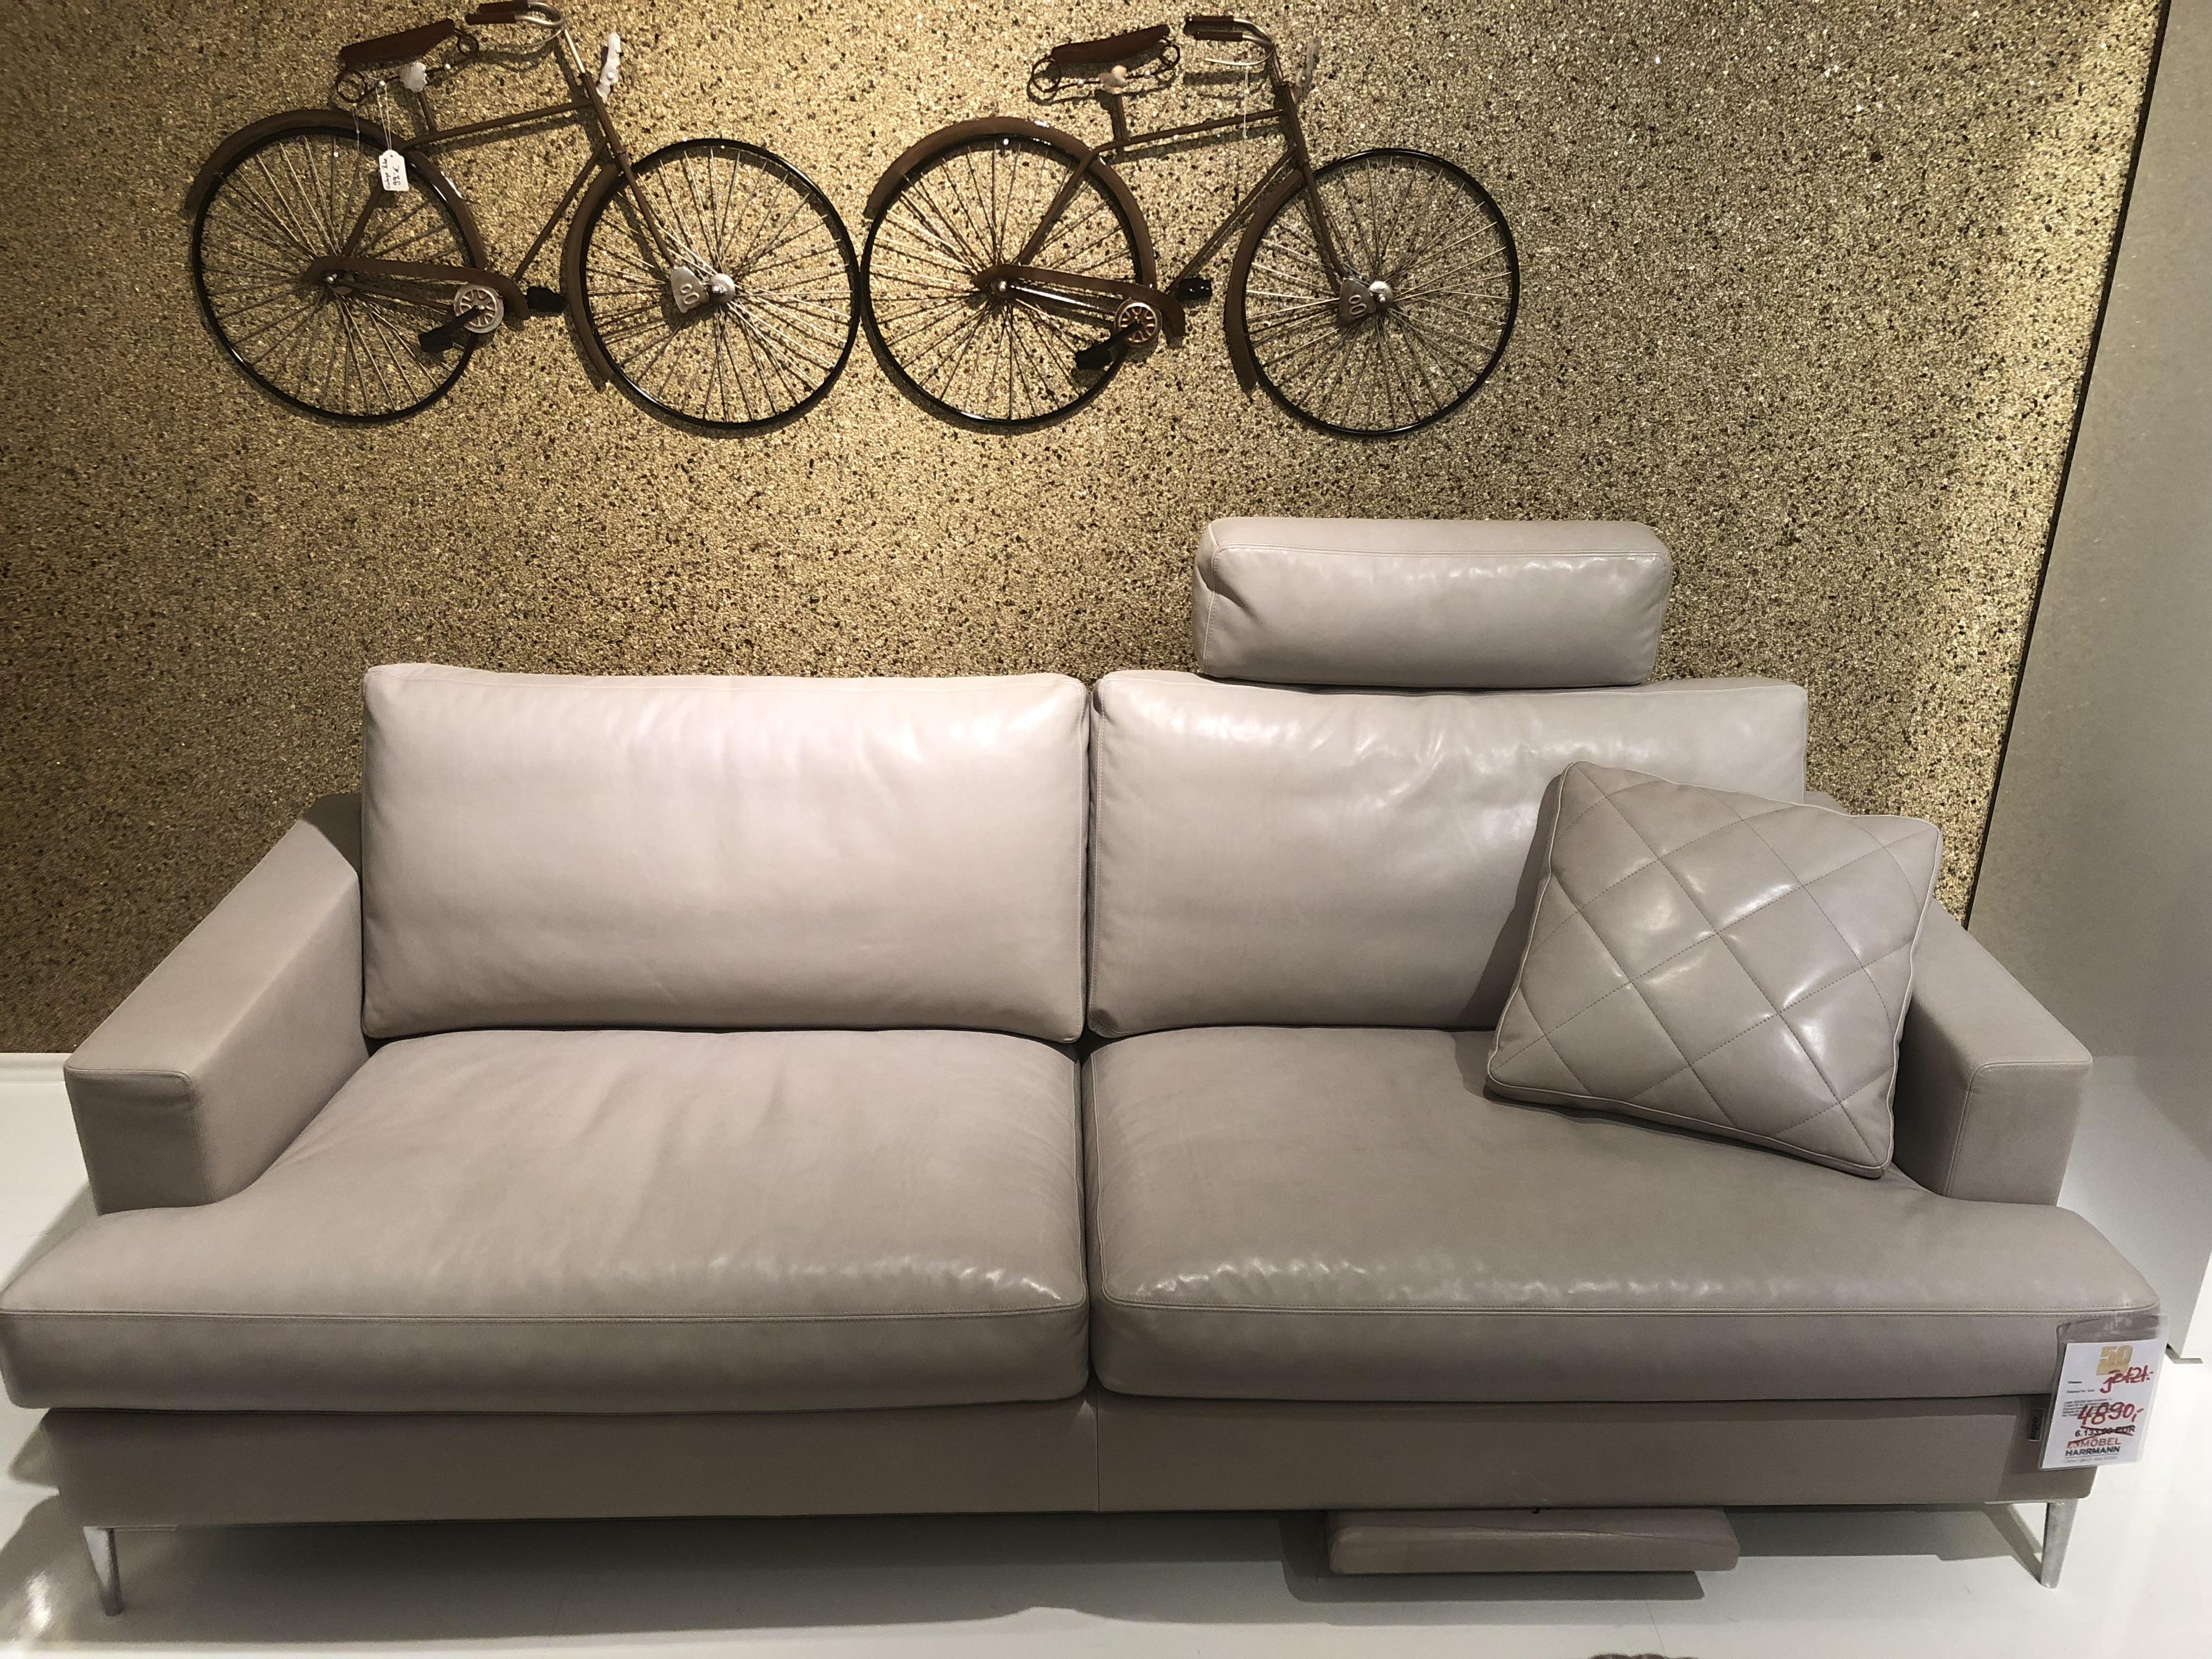 mein ausstellungsst ck erpo classics 740 sofa. Black Bedroom Furniture Sets. Home Design Ideas